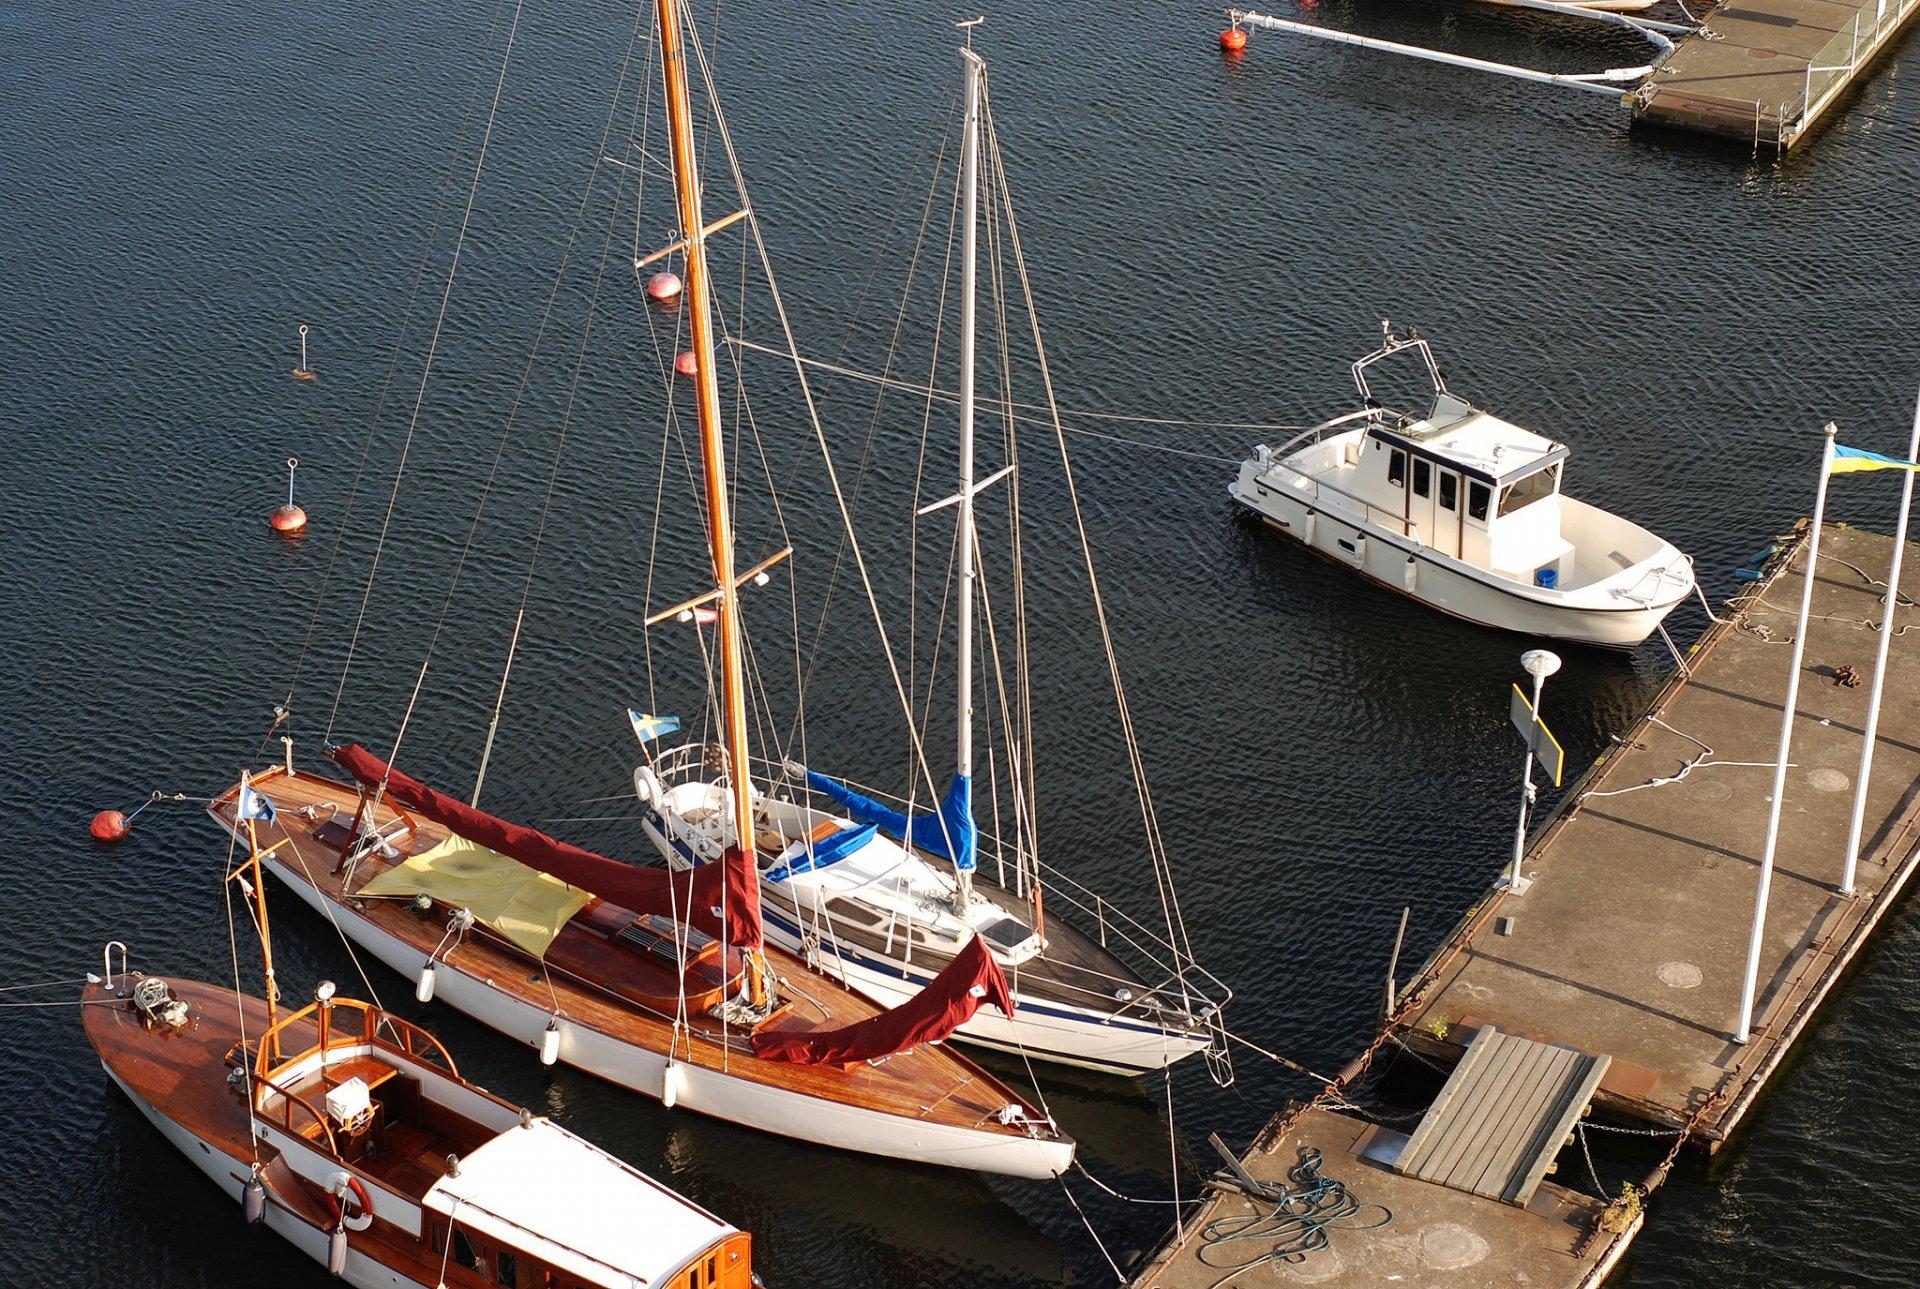 Фото гога ашкенази и миллиардер на яхте вашему вниманию